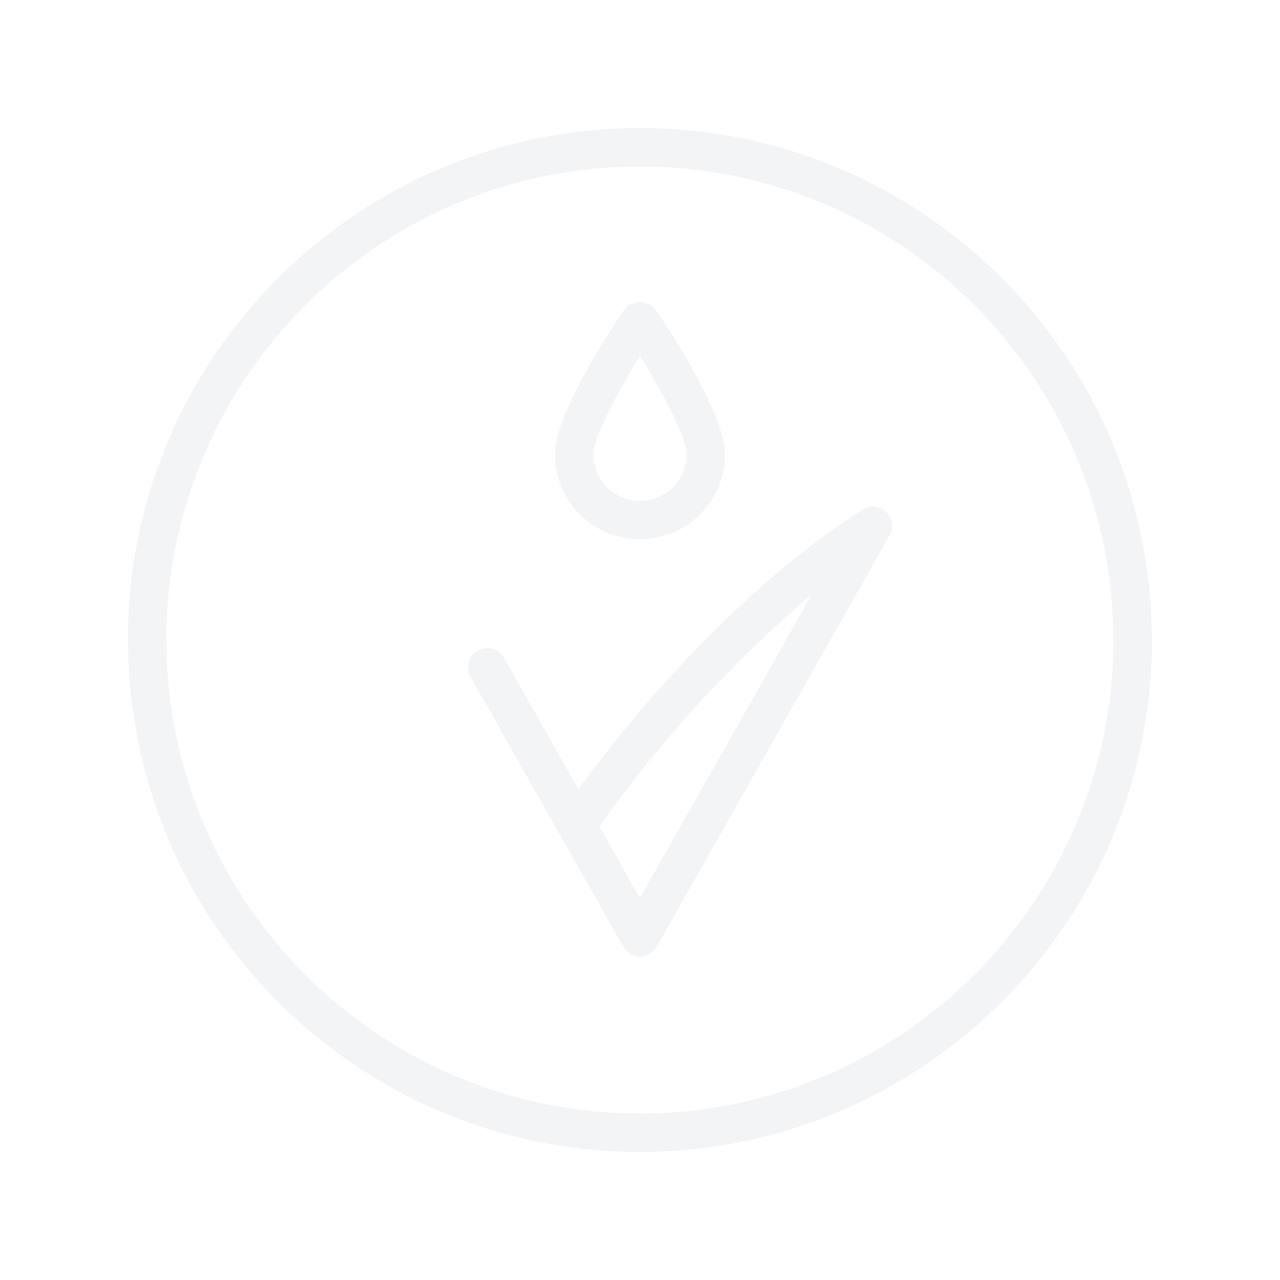 BALMAIN Cordless Titanium Straightener Gift Set